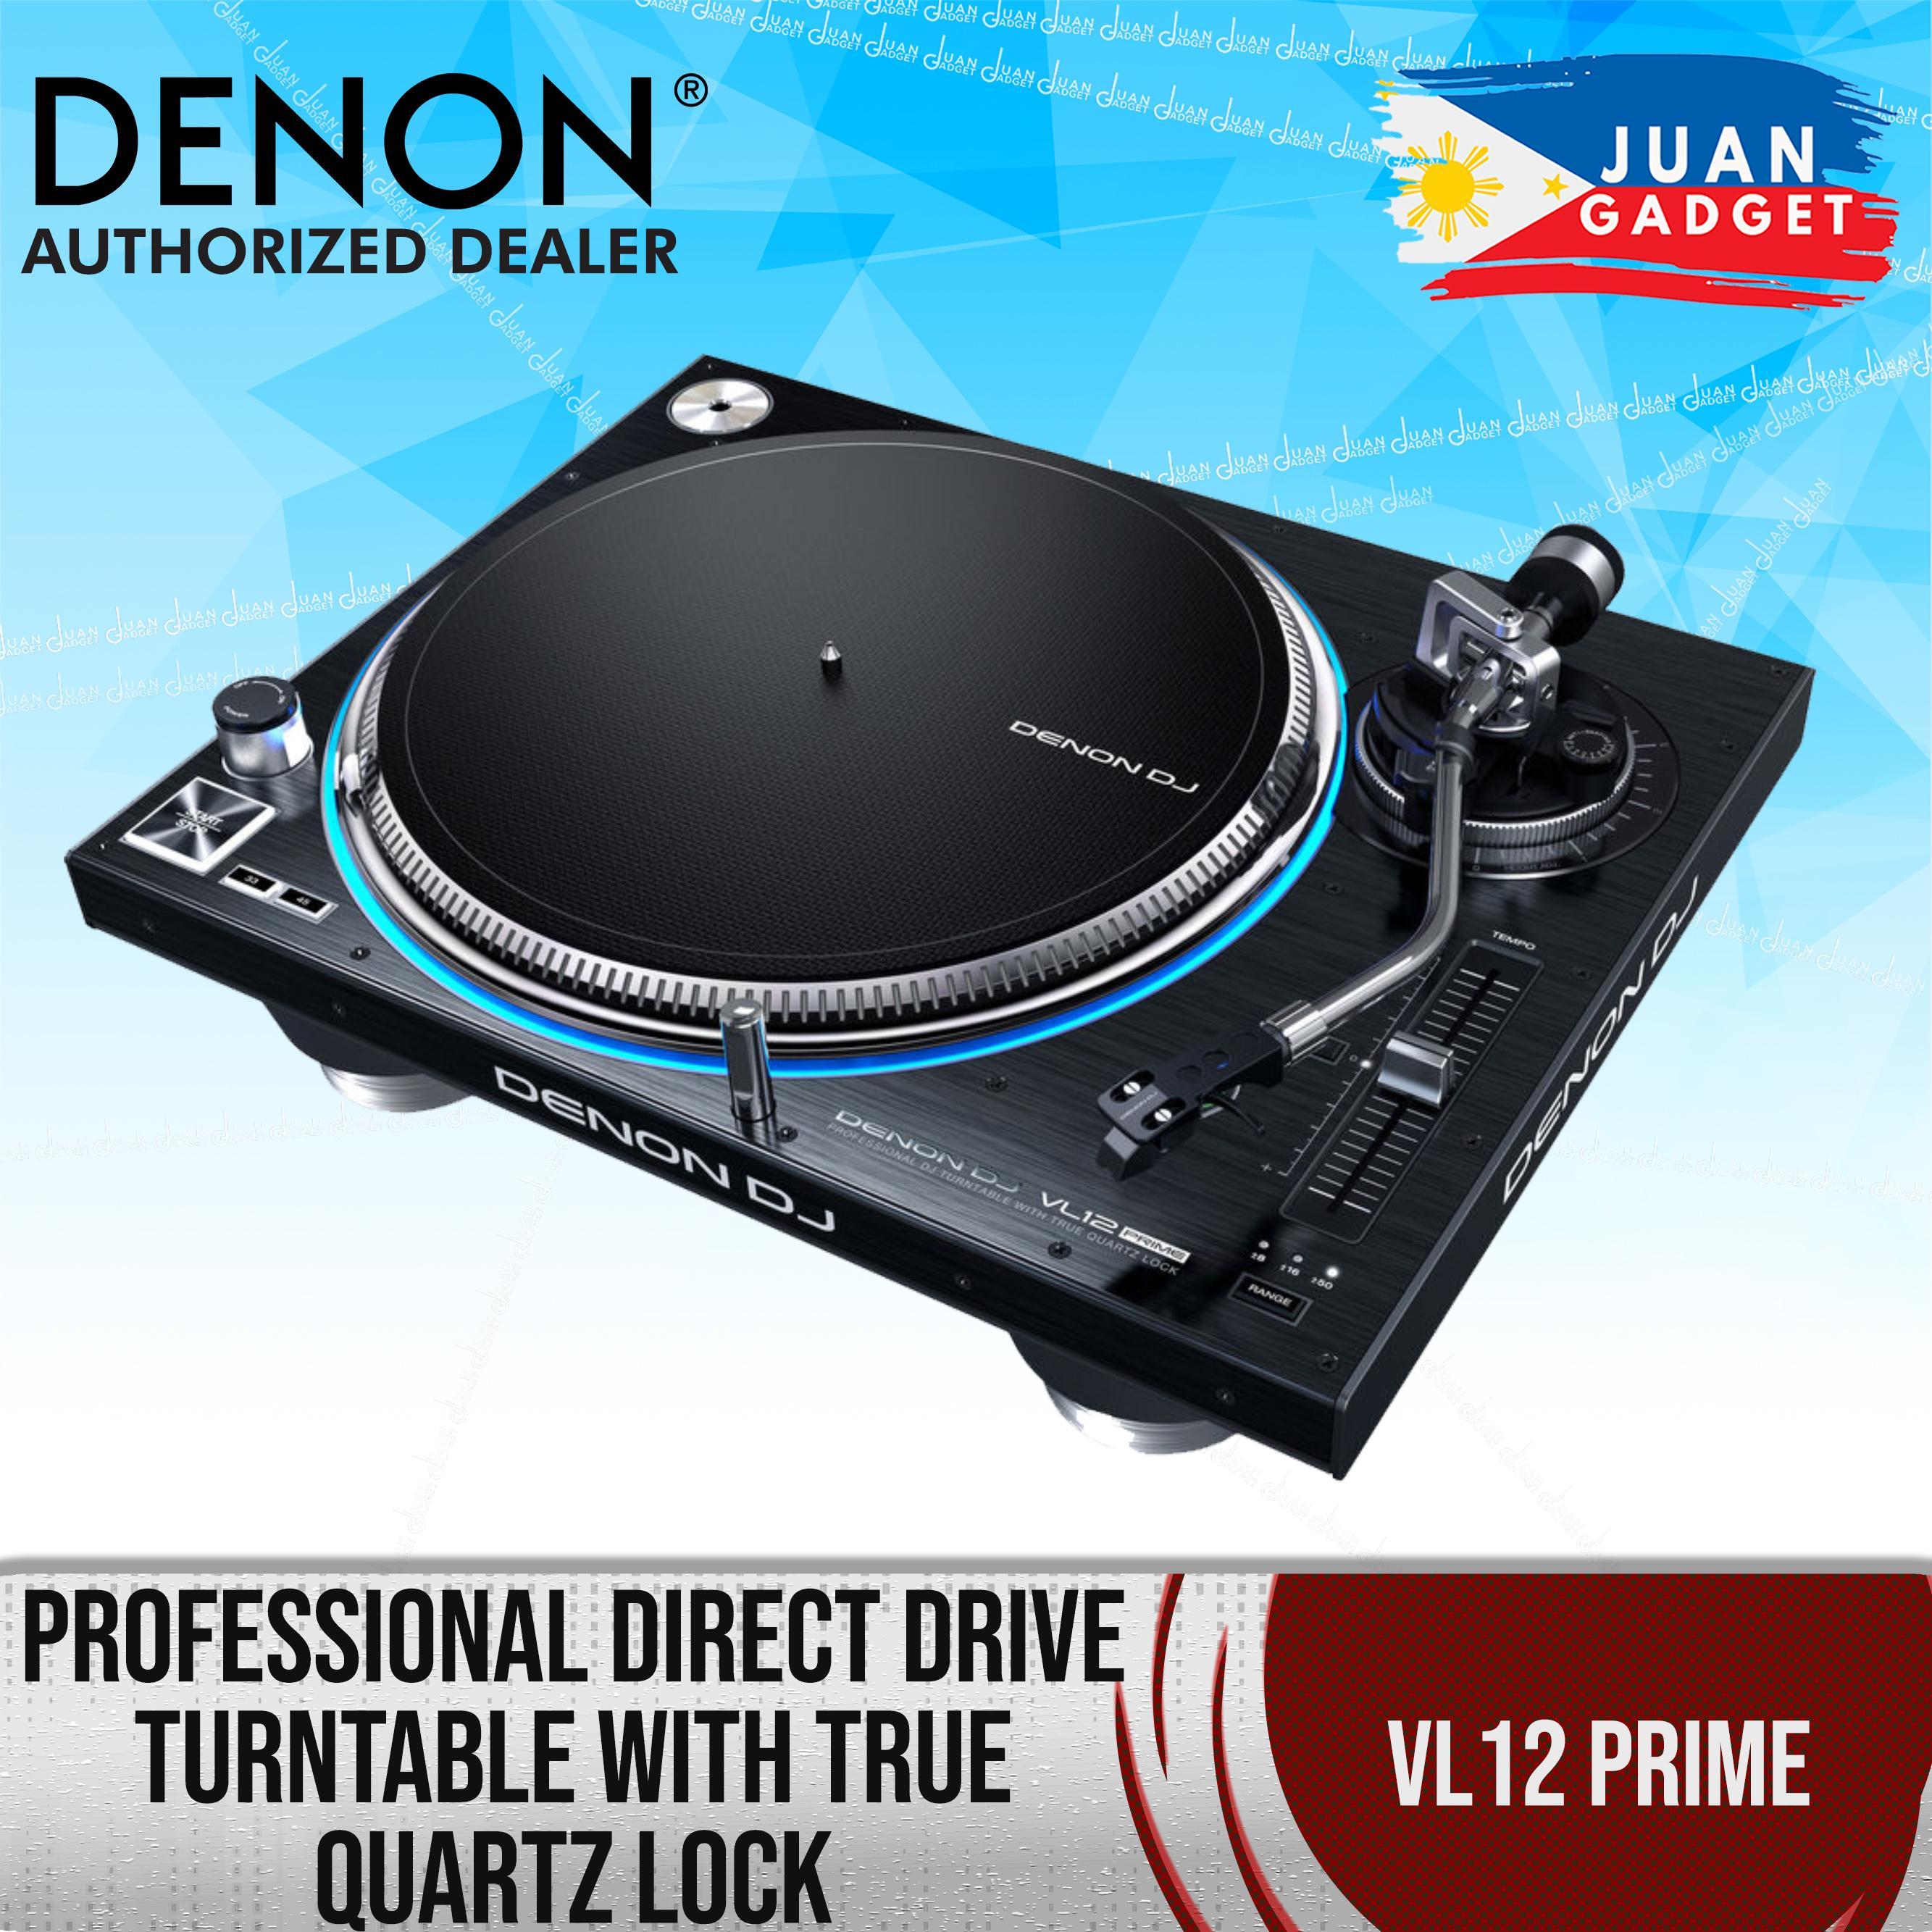 Denon Philippines: Denon price list - Home Entertainment